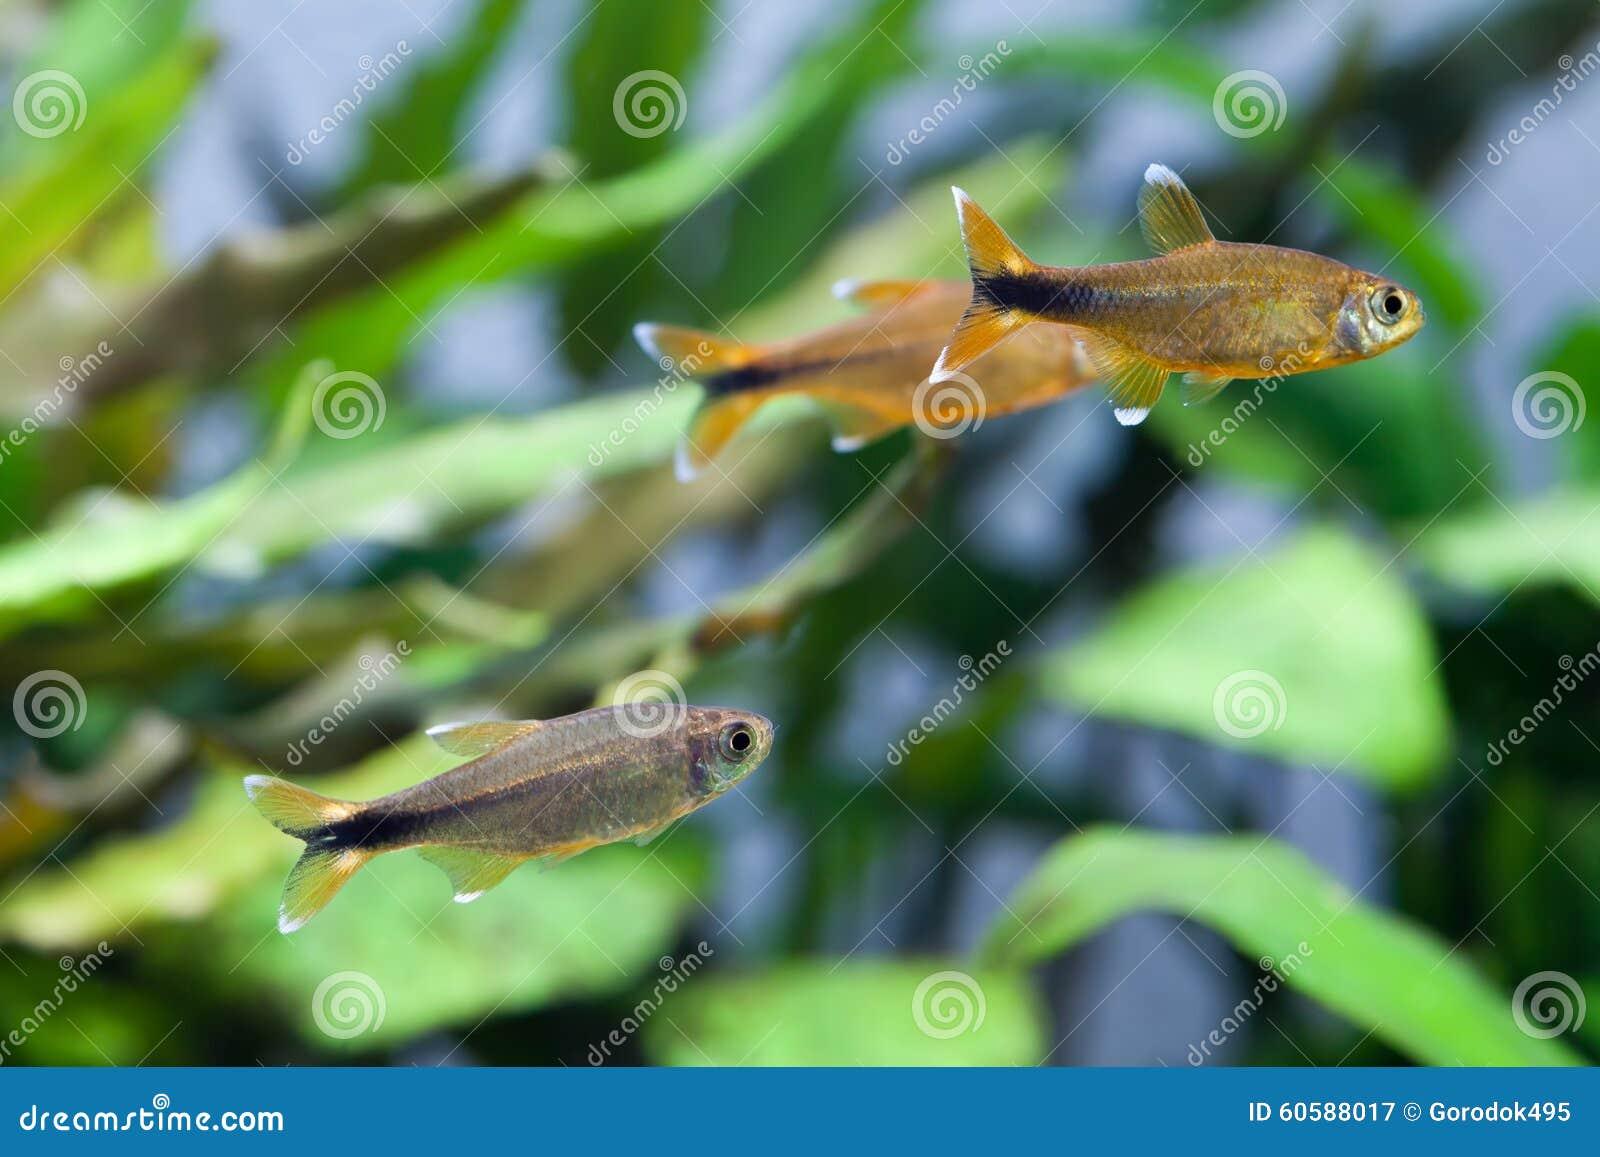 Swimming Silver Tipped Tetra Fishes. Gold, Orange Colorful Aquarium ...